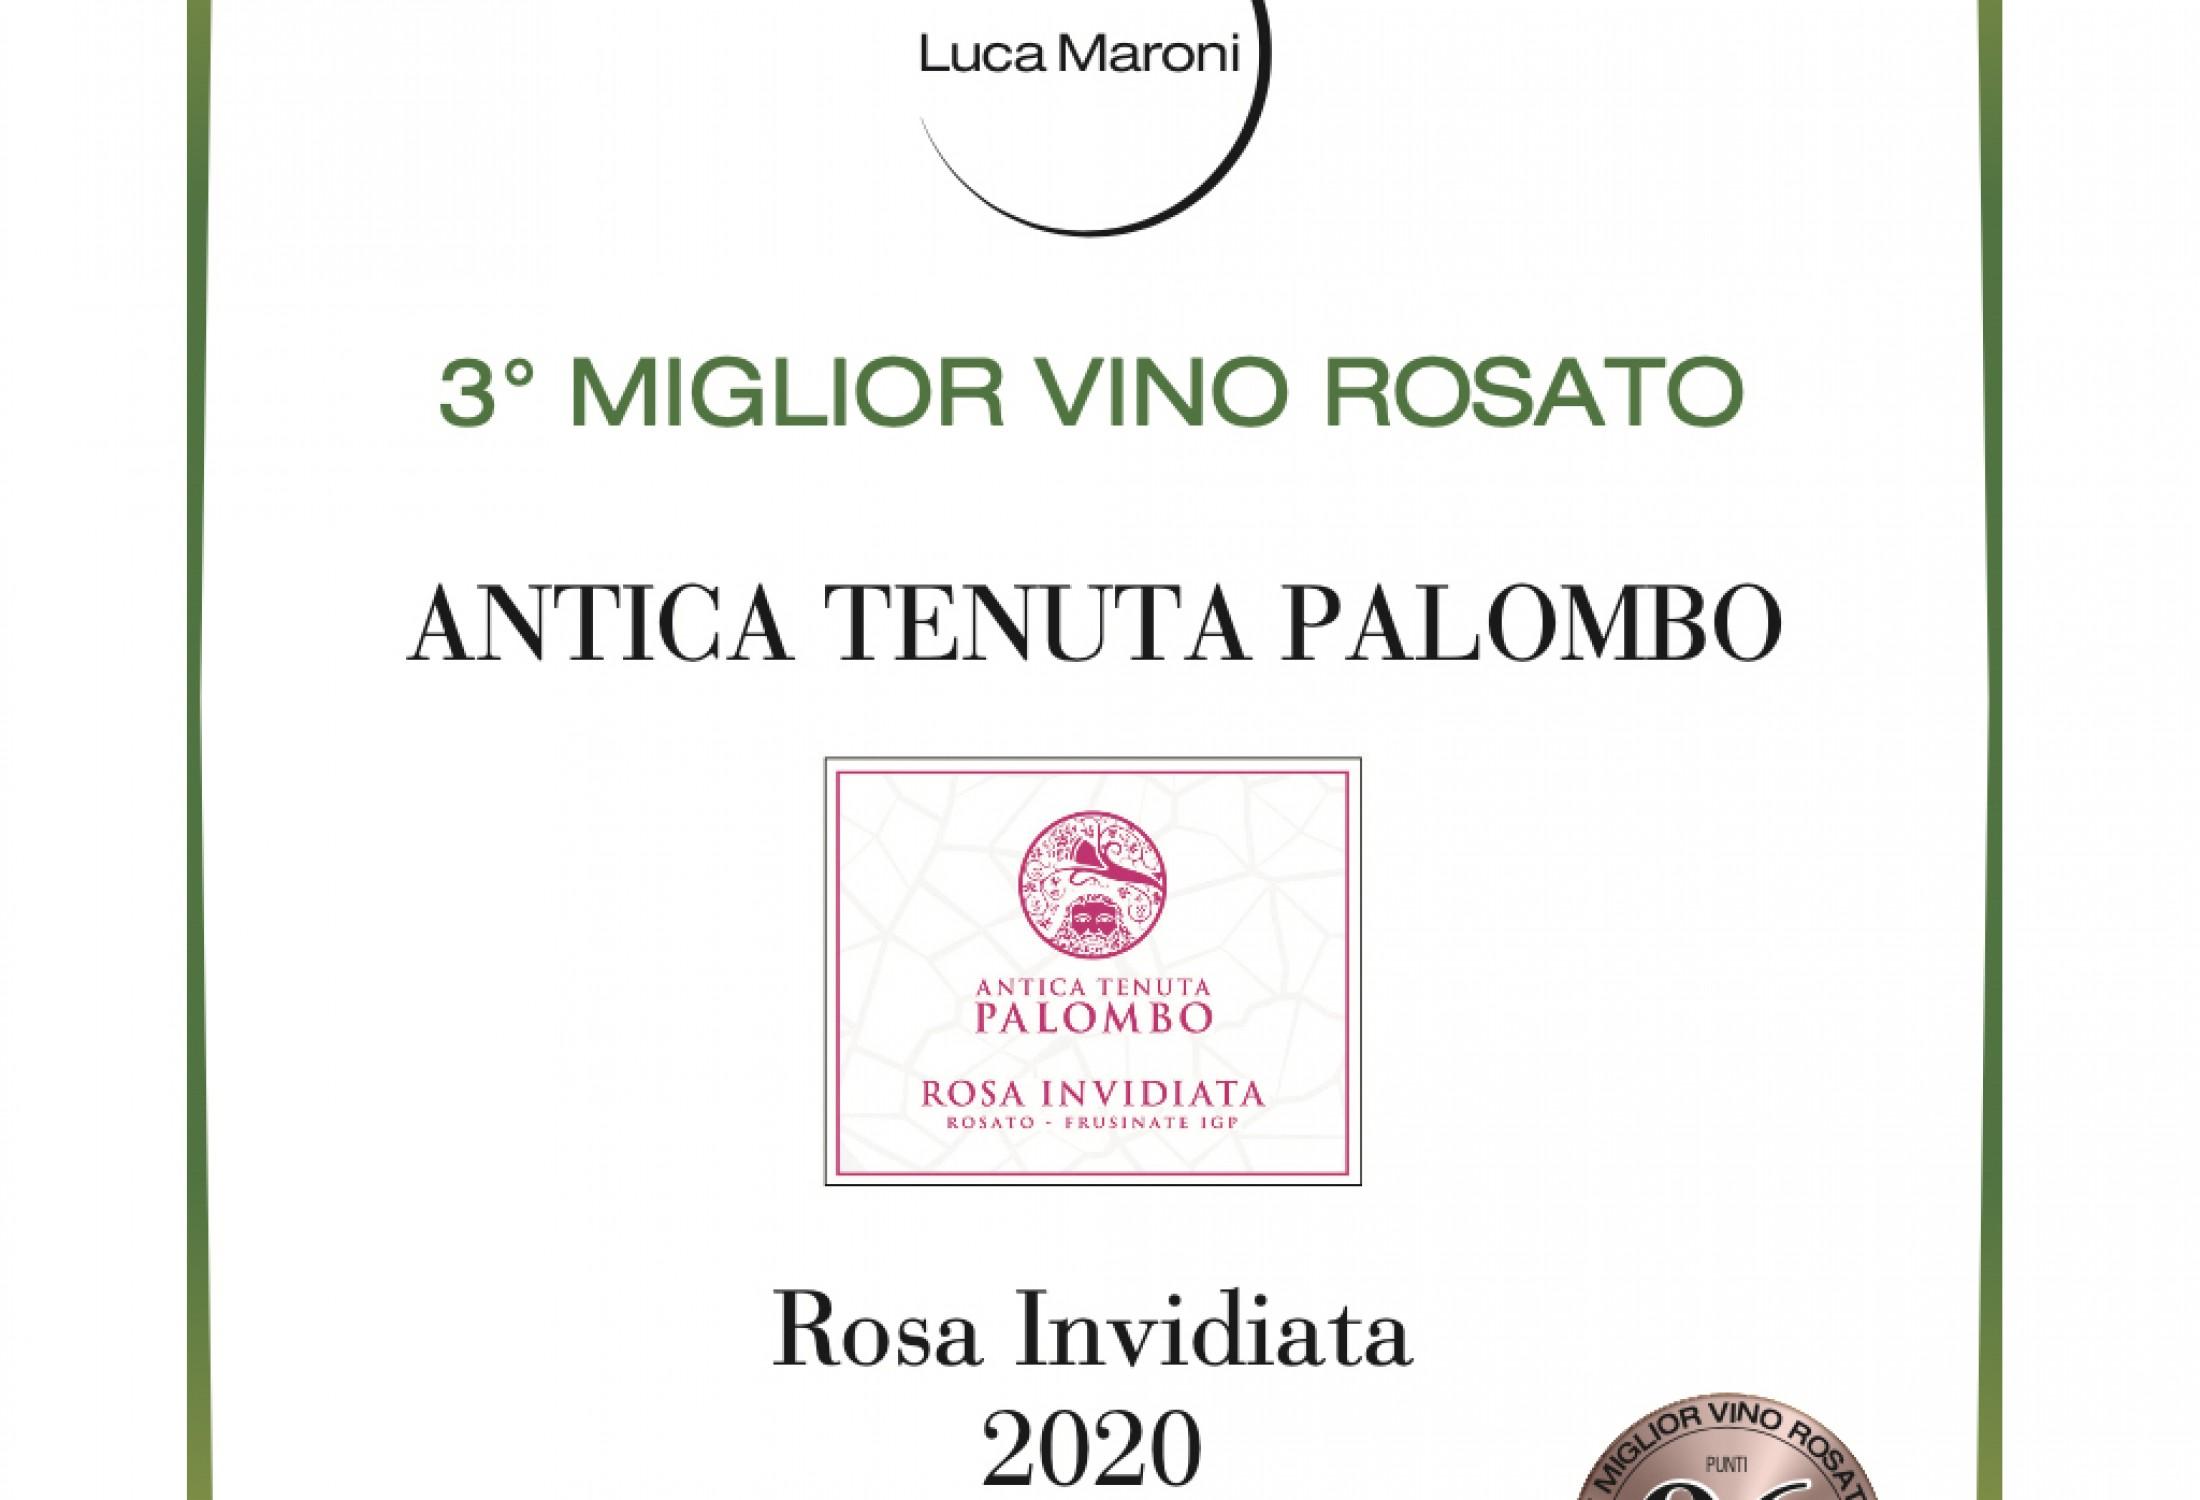 Rosa Invidiata 2020  -  3° Miglior vino rosato